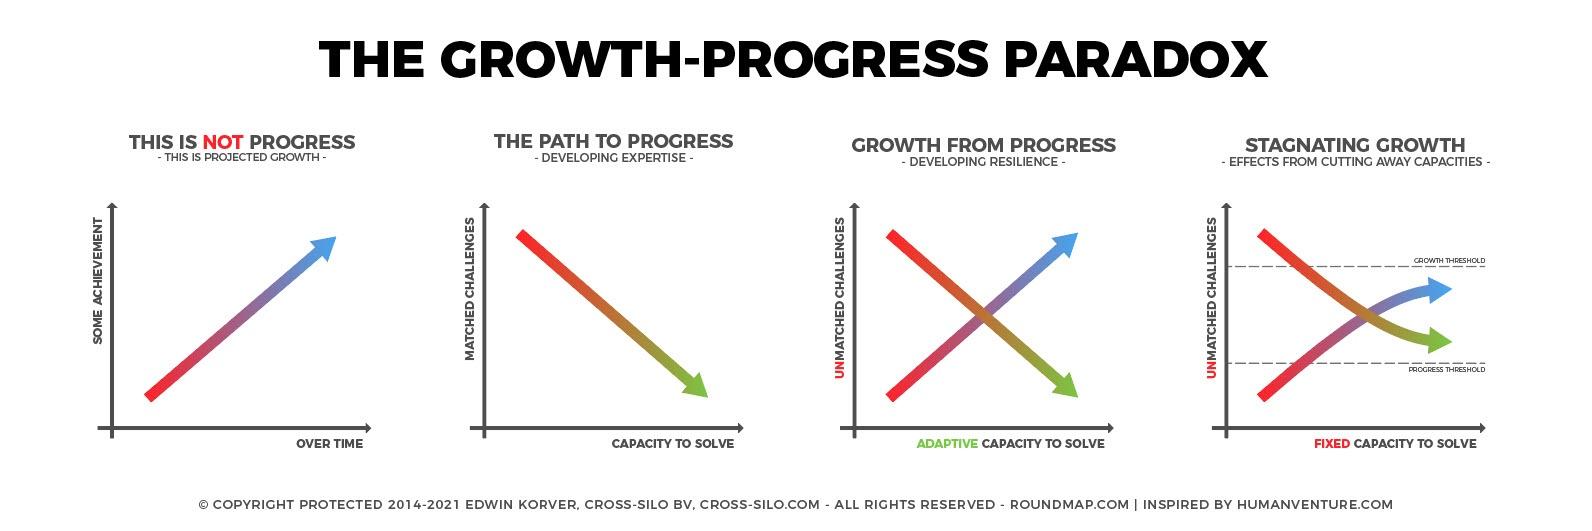 ROUNDMAP_Growth_Progress_Paradox_Copyright_Protected_2021